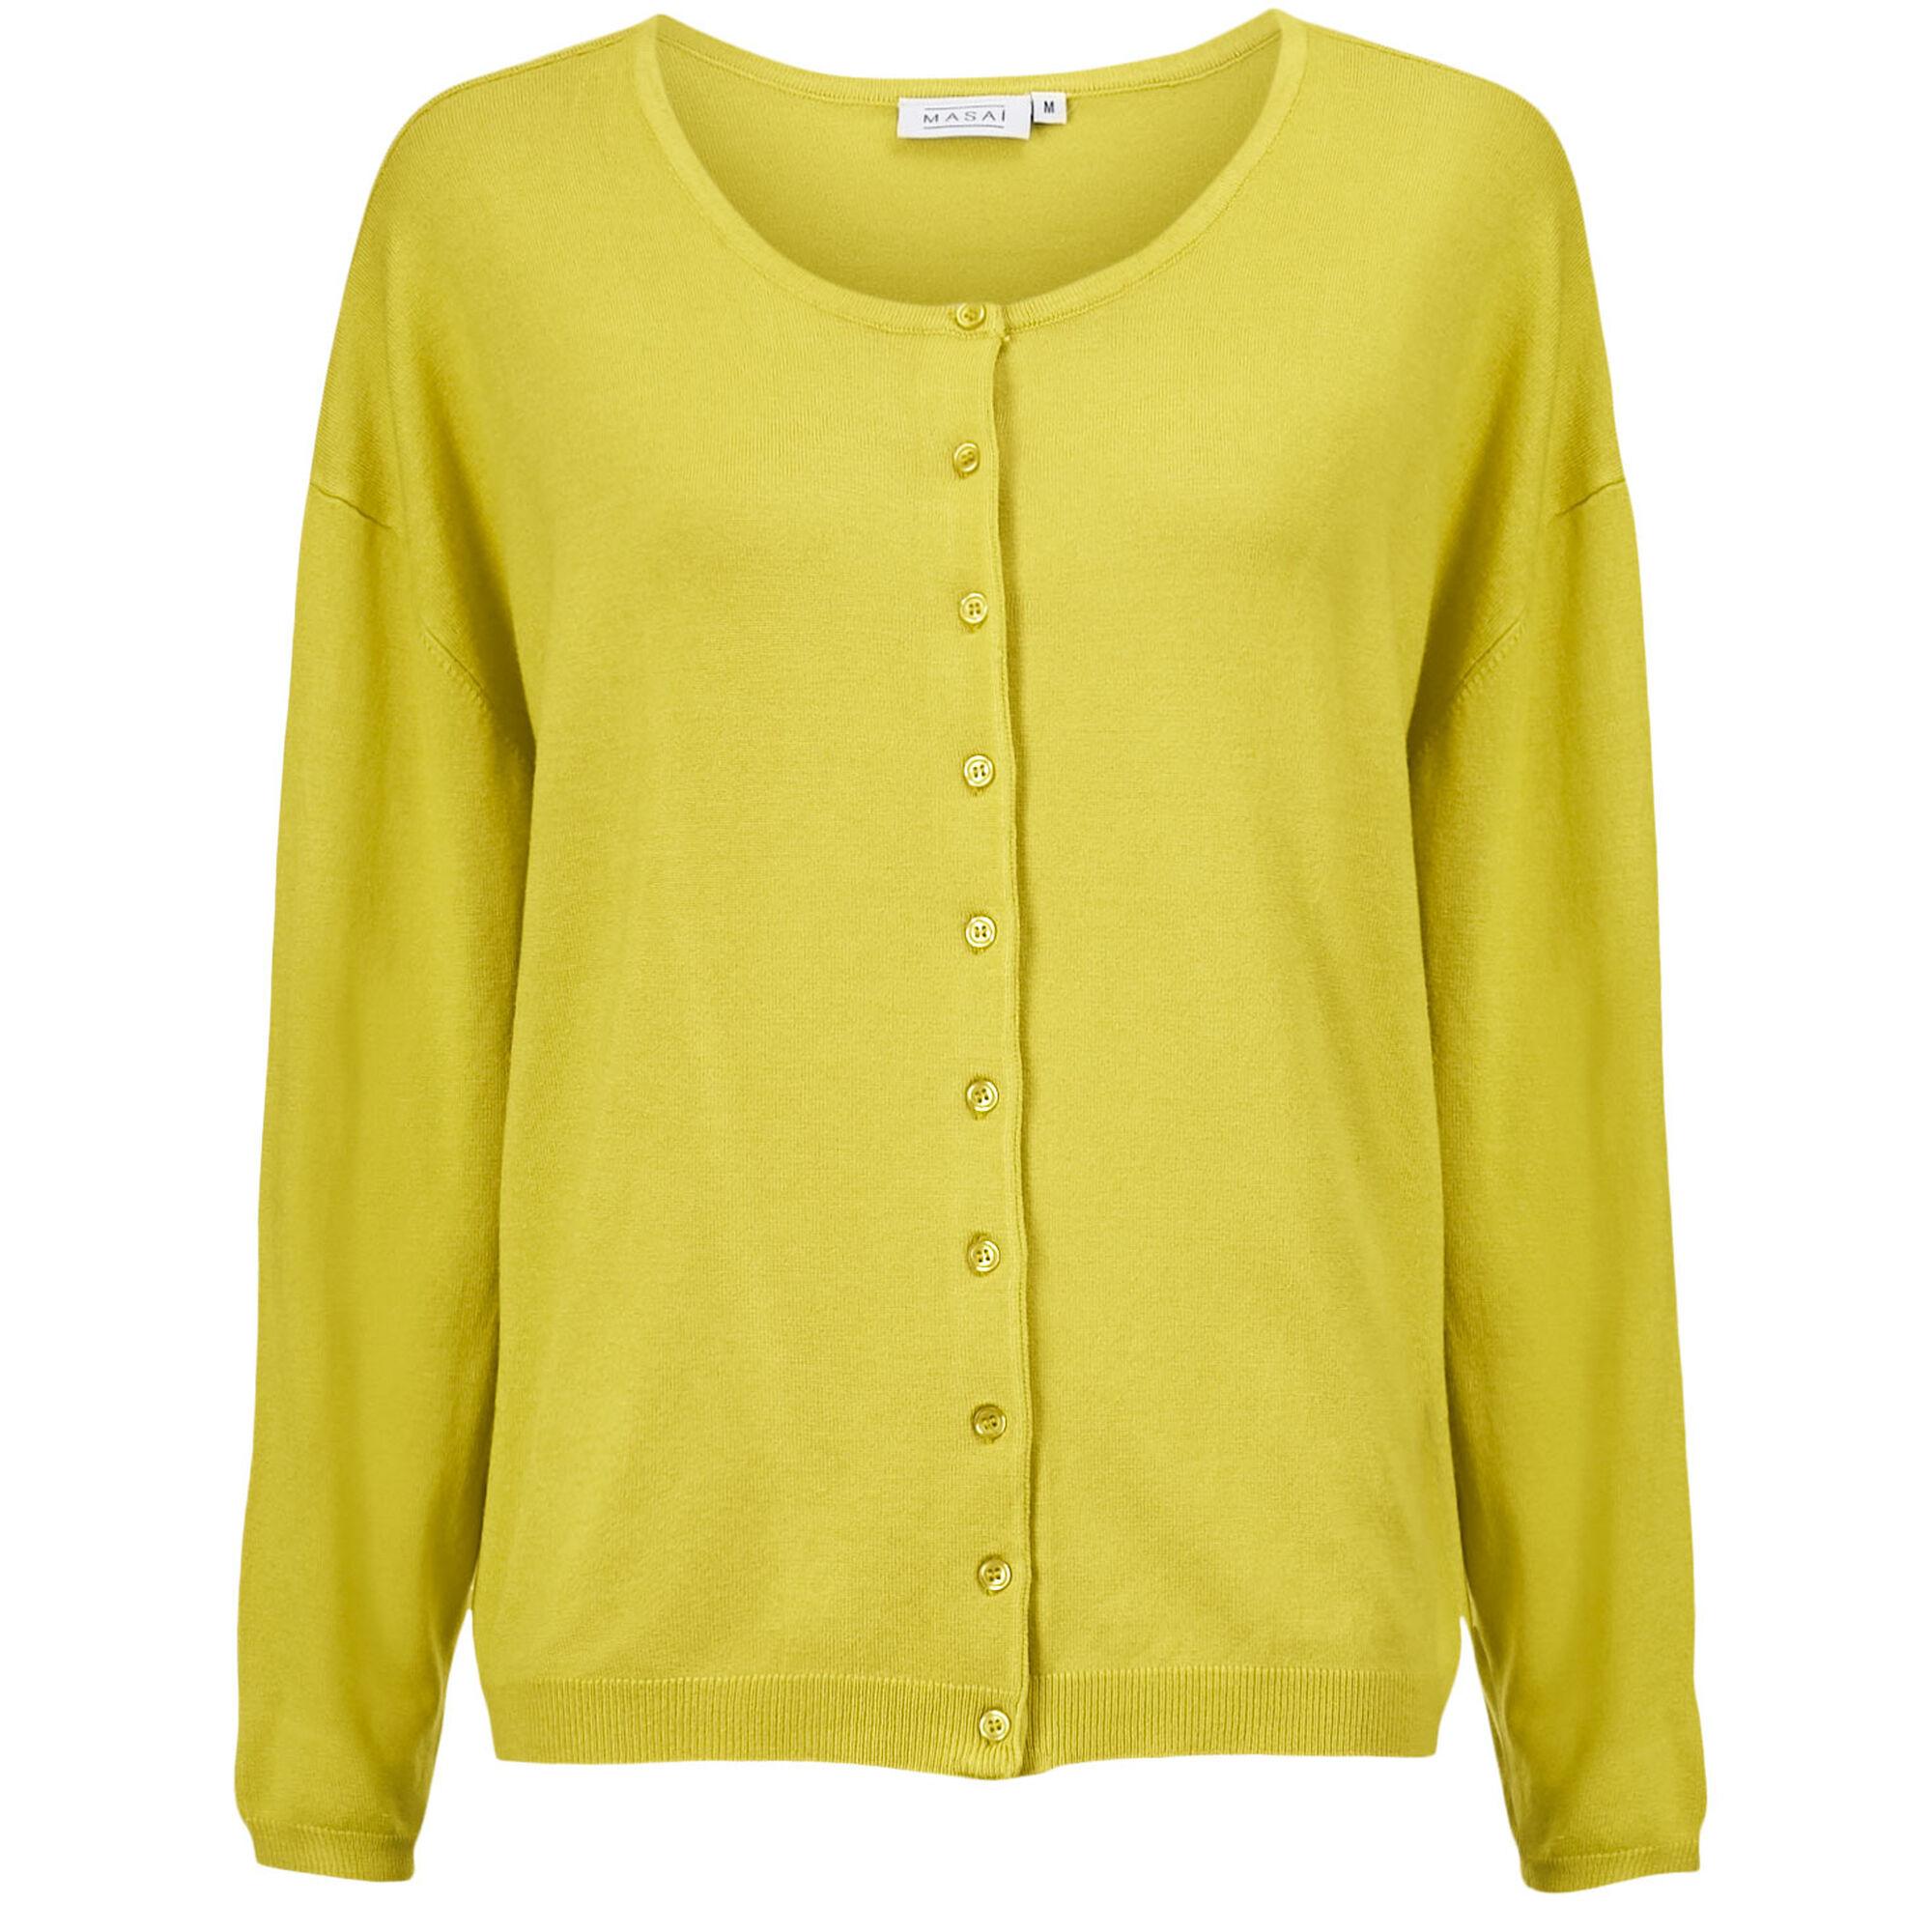 LENKA KOFTA, Oil Yellow, hi-res